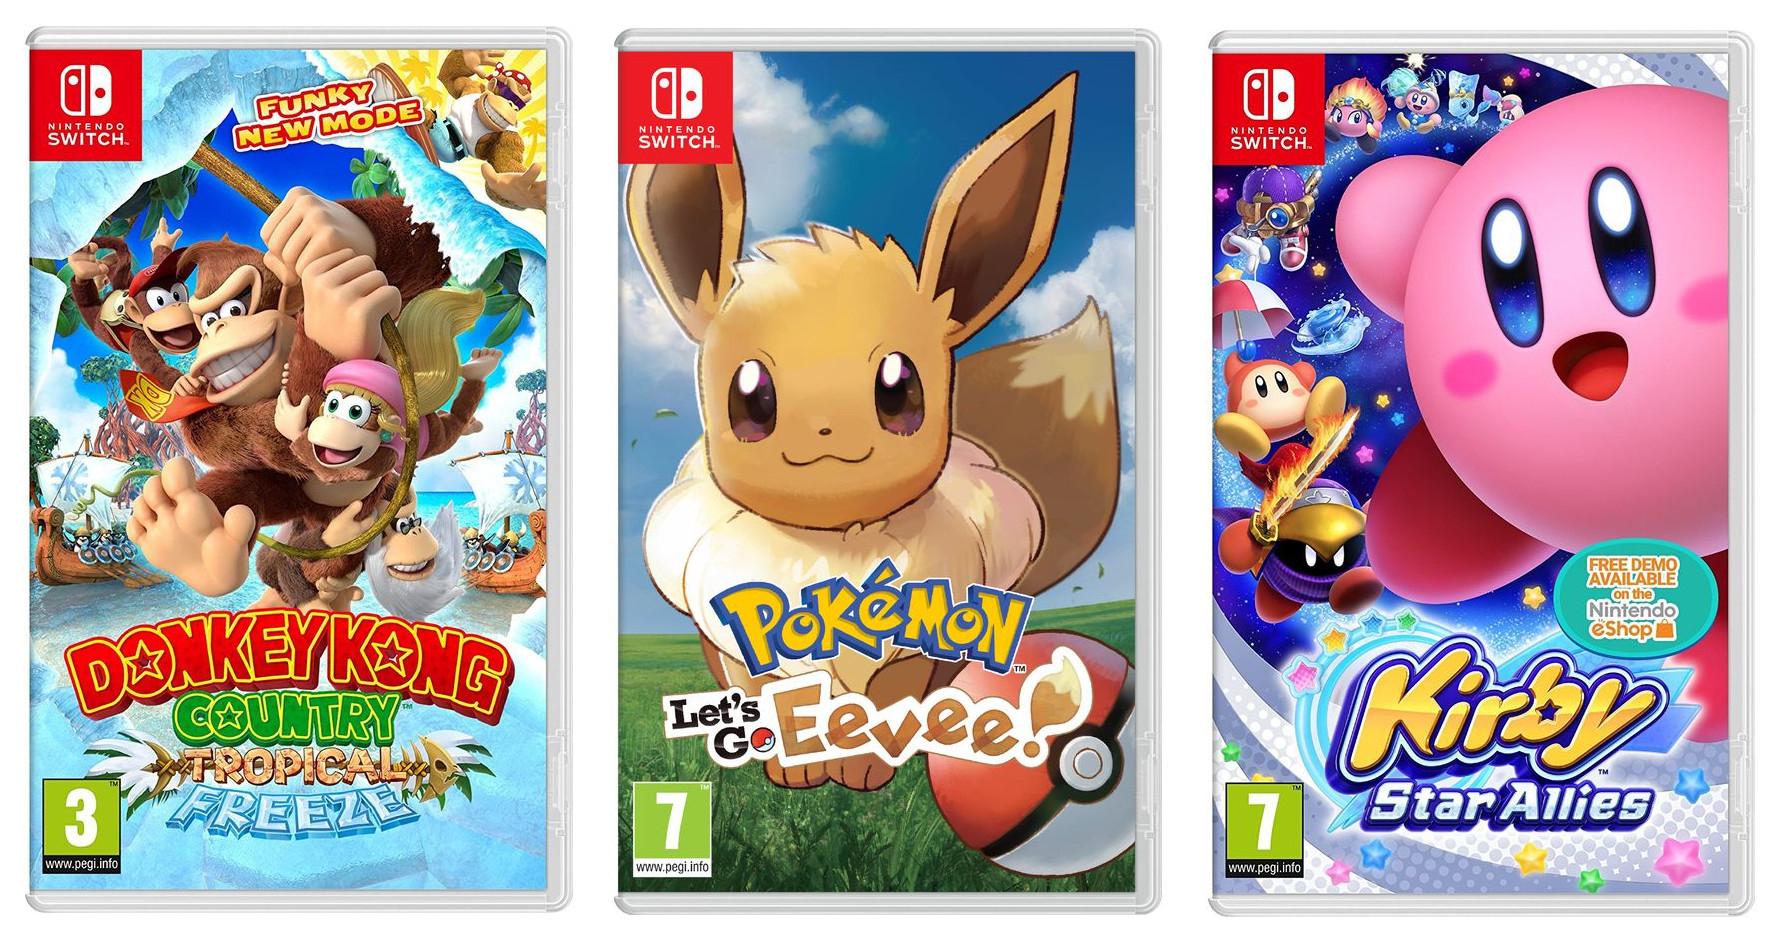 Donkey Kong Country: Tropical Freeze / Pokémon: Let's Go, Eevee! / Kirby Star Allies (Switch) +Spotify Premium - £36.99 each @ Currys